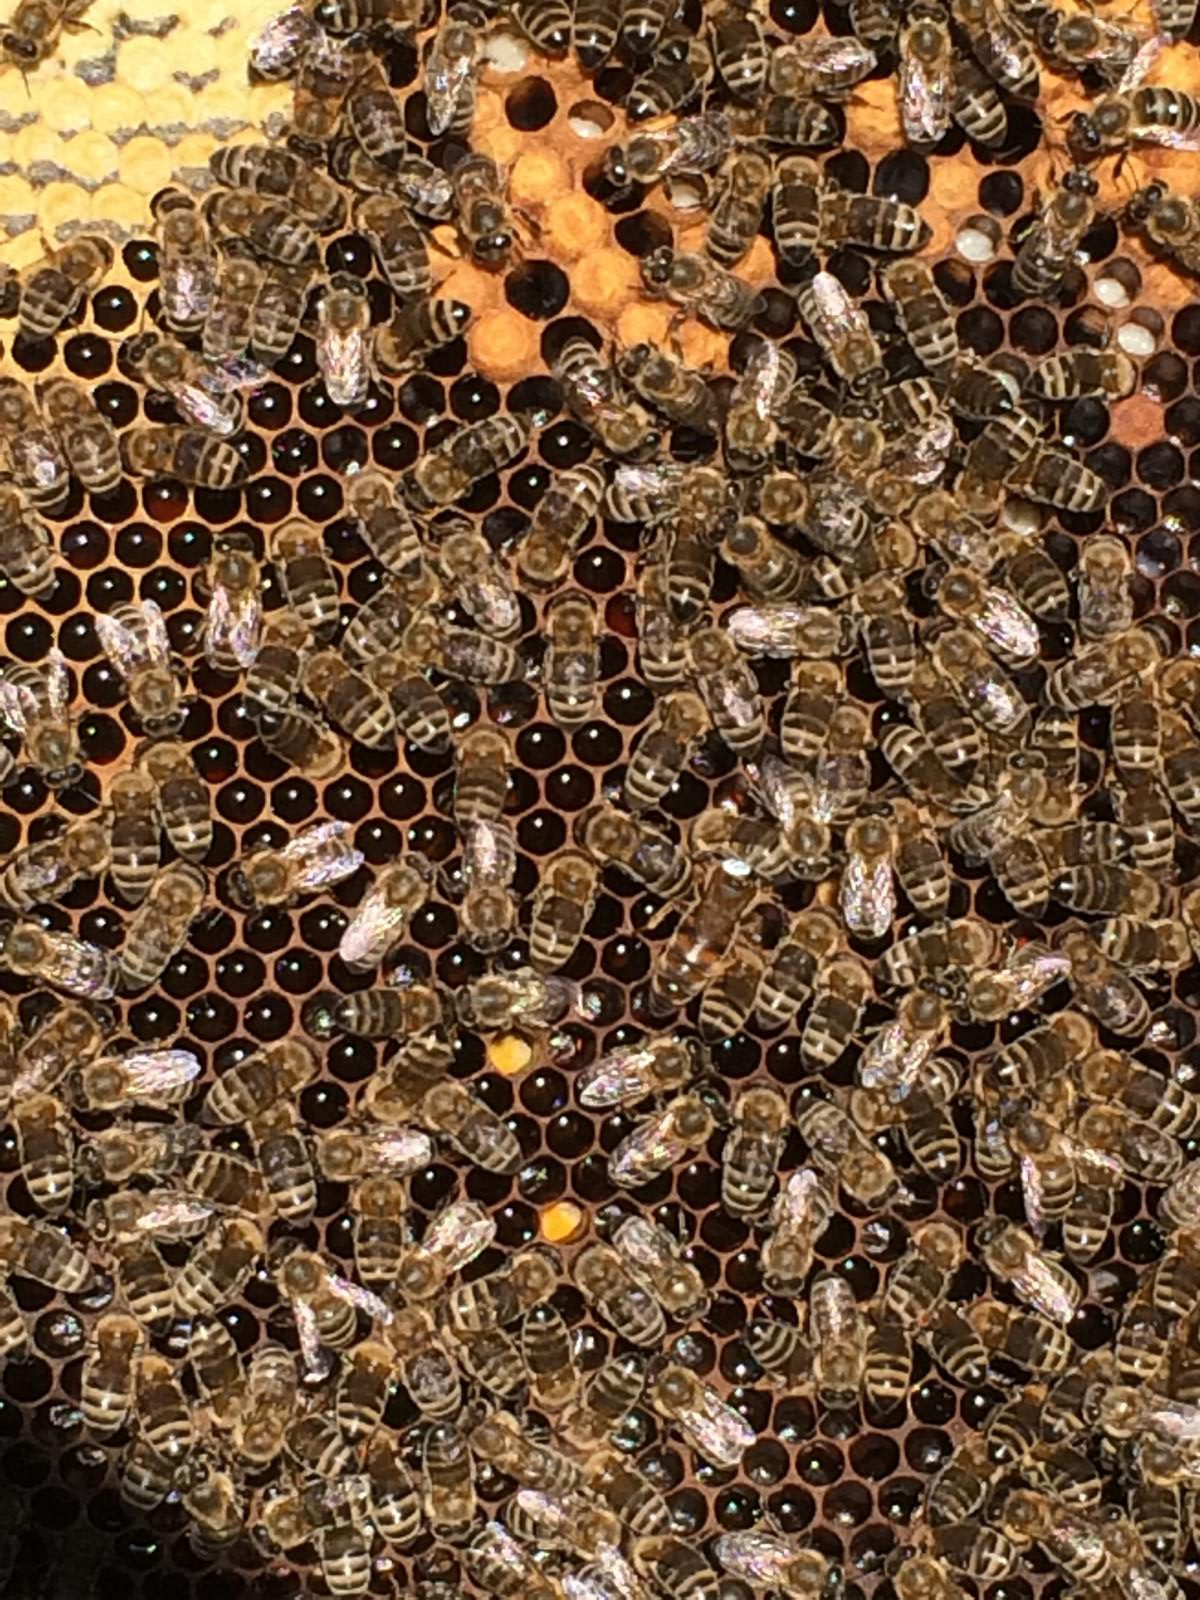 Honigwabe Wabe Flecke Saaten Handel Honig Bienen Bienenvolk Bienenstock